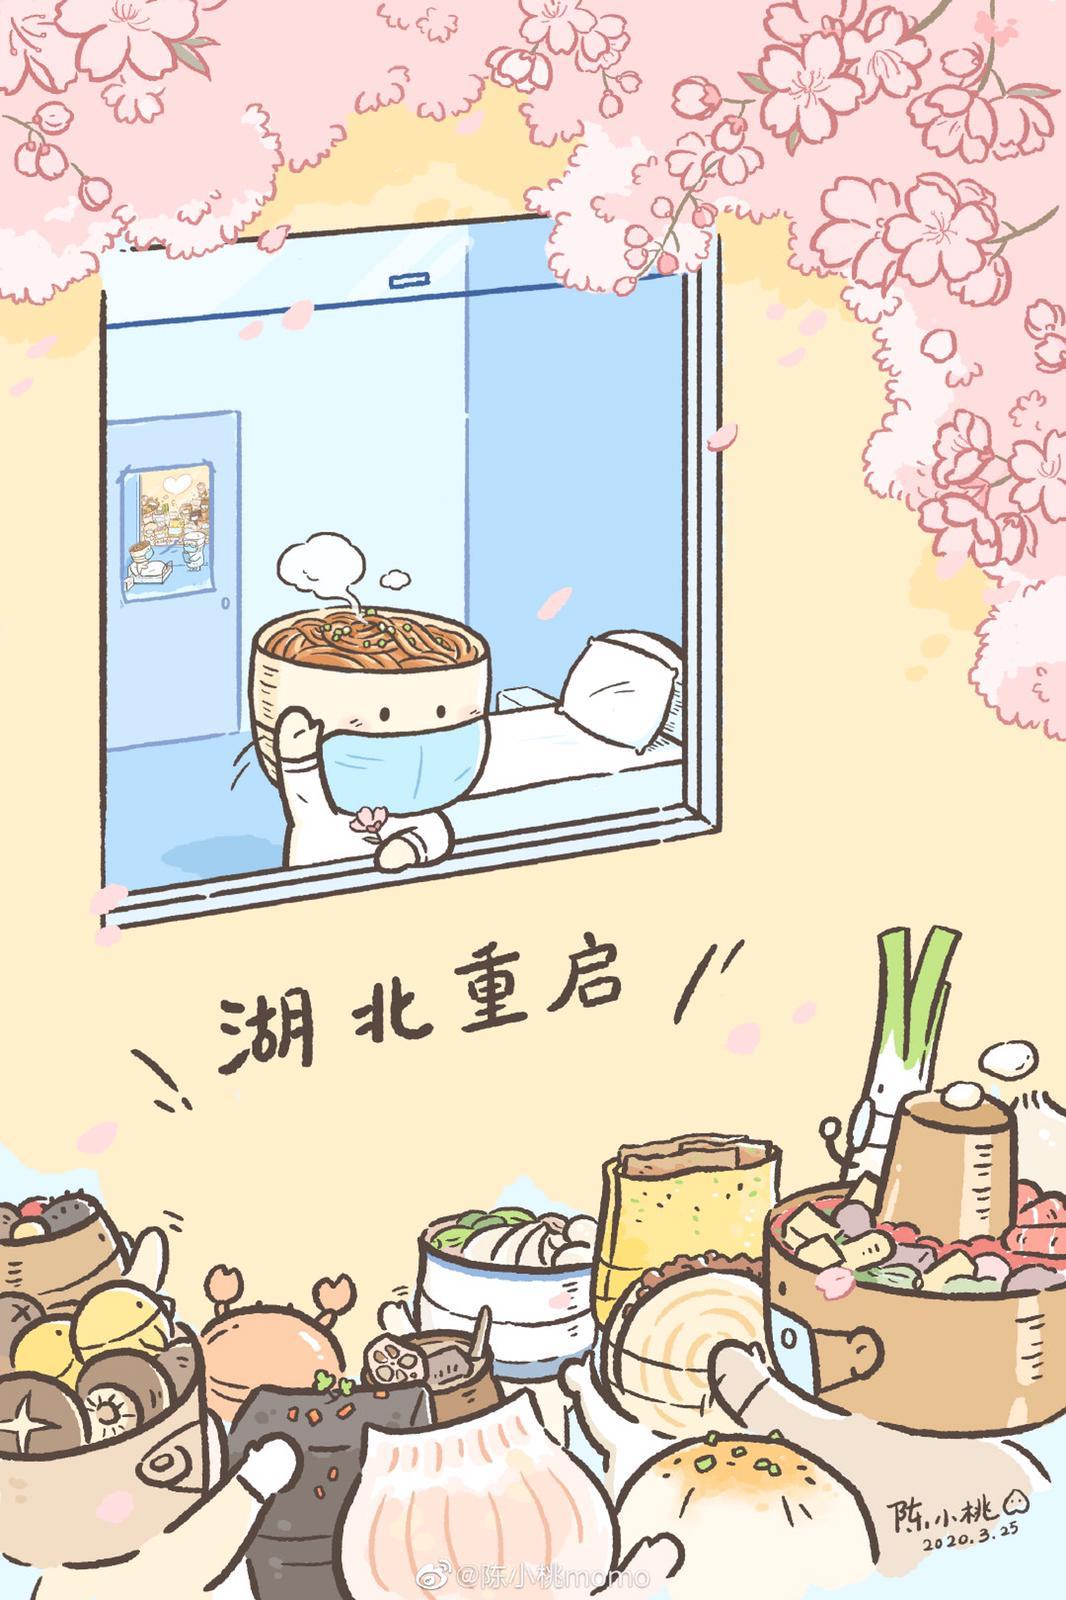 Credit: Chen Xiaotao Momo